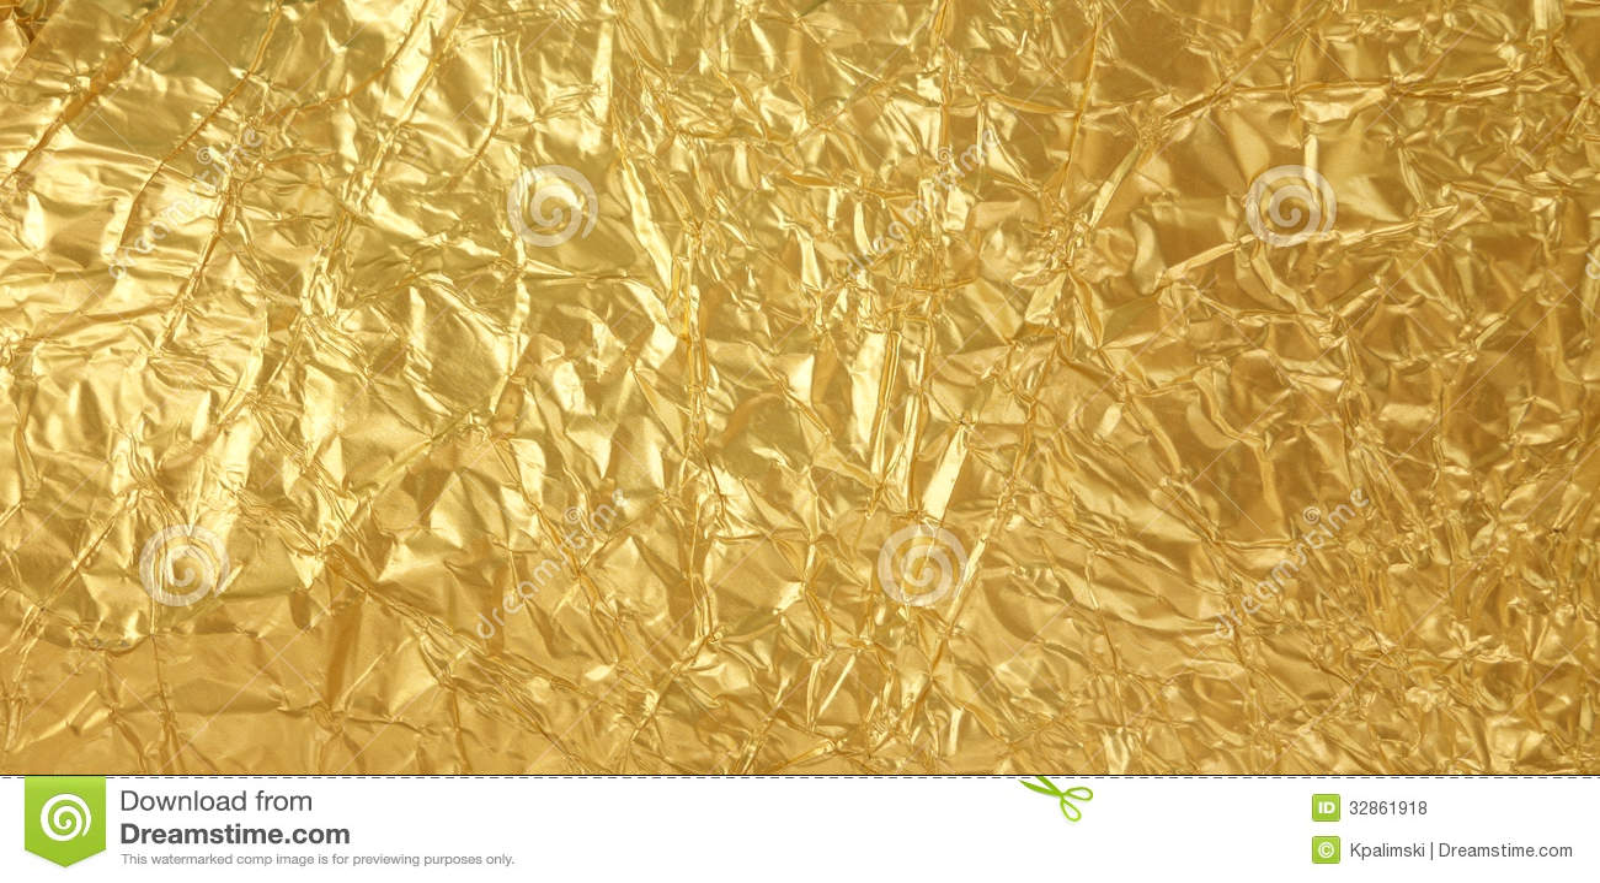 Golden Foil Texture Royalty Free Stock Photos - Image: 32861918